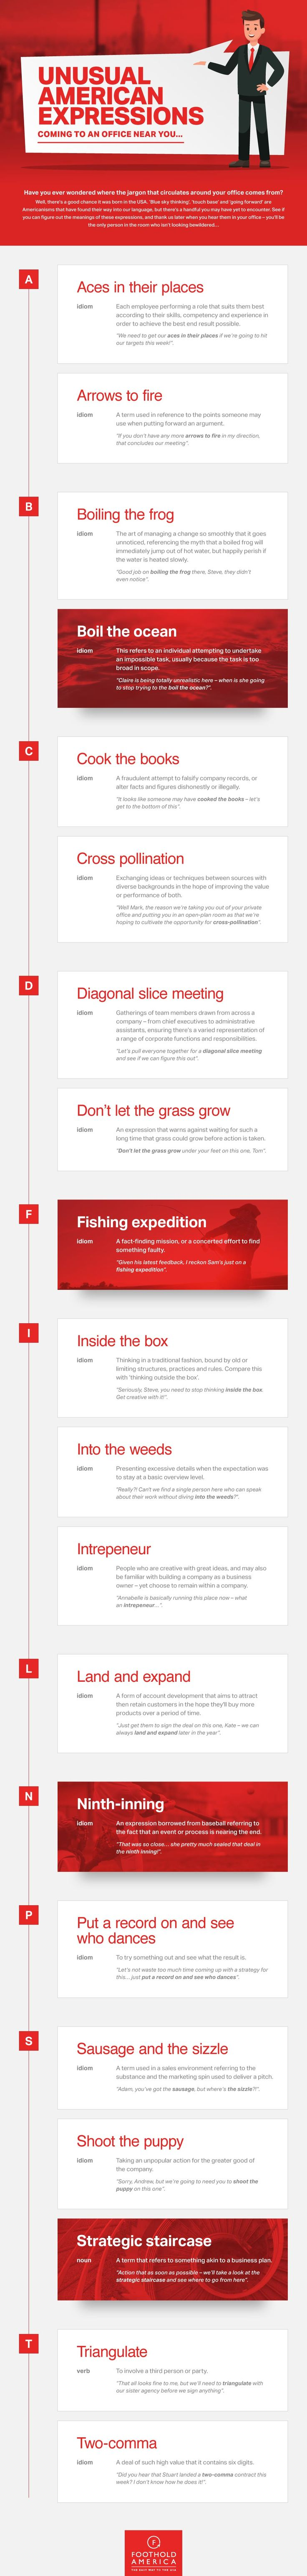 685 best Freelance Tip images on Pinterest | Alarm app, Alarm clock ...